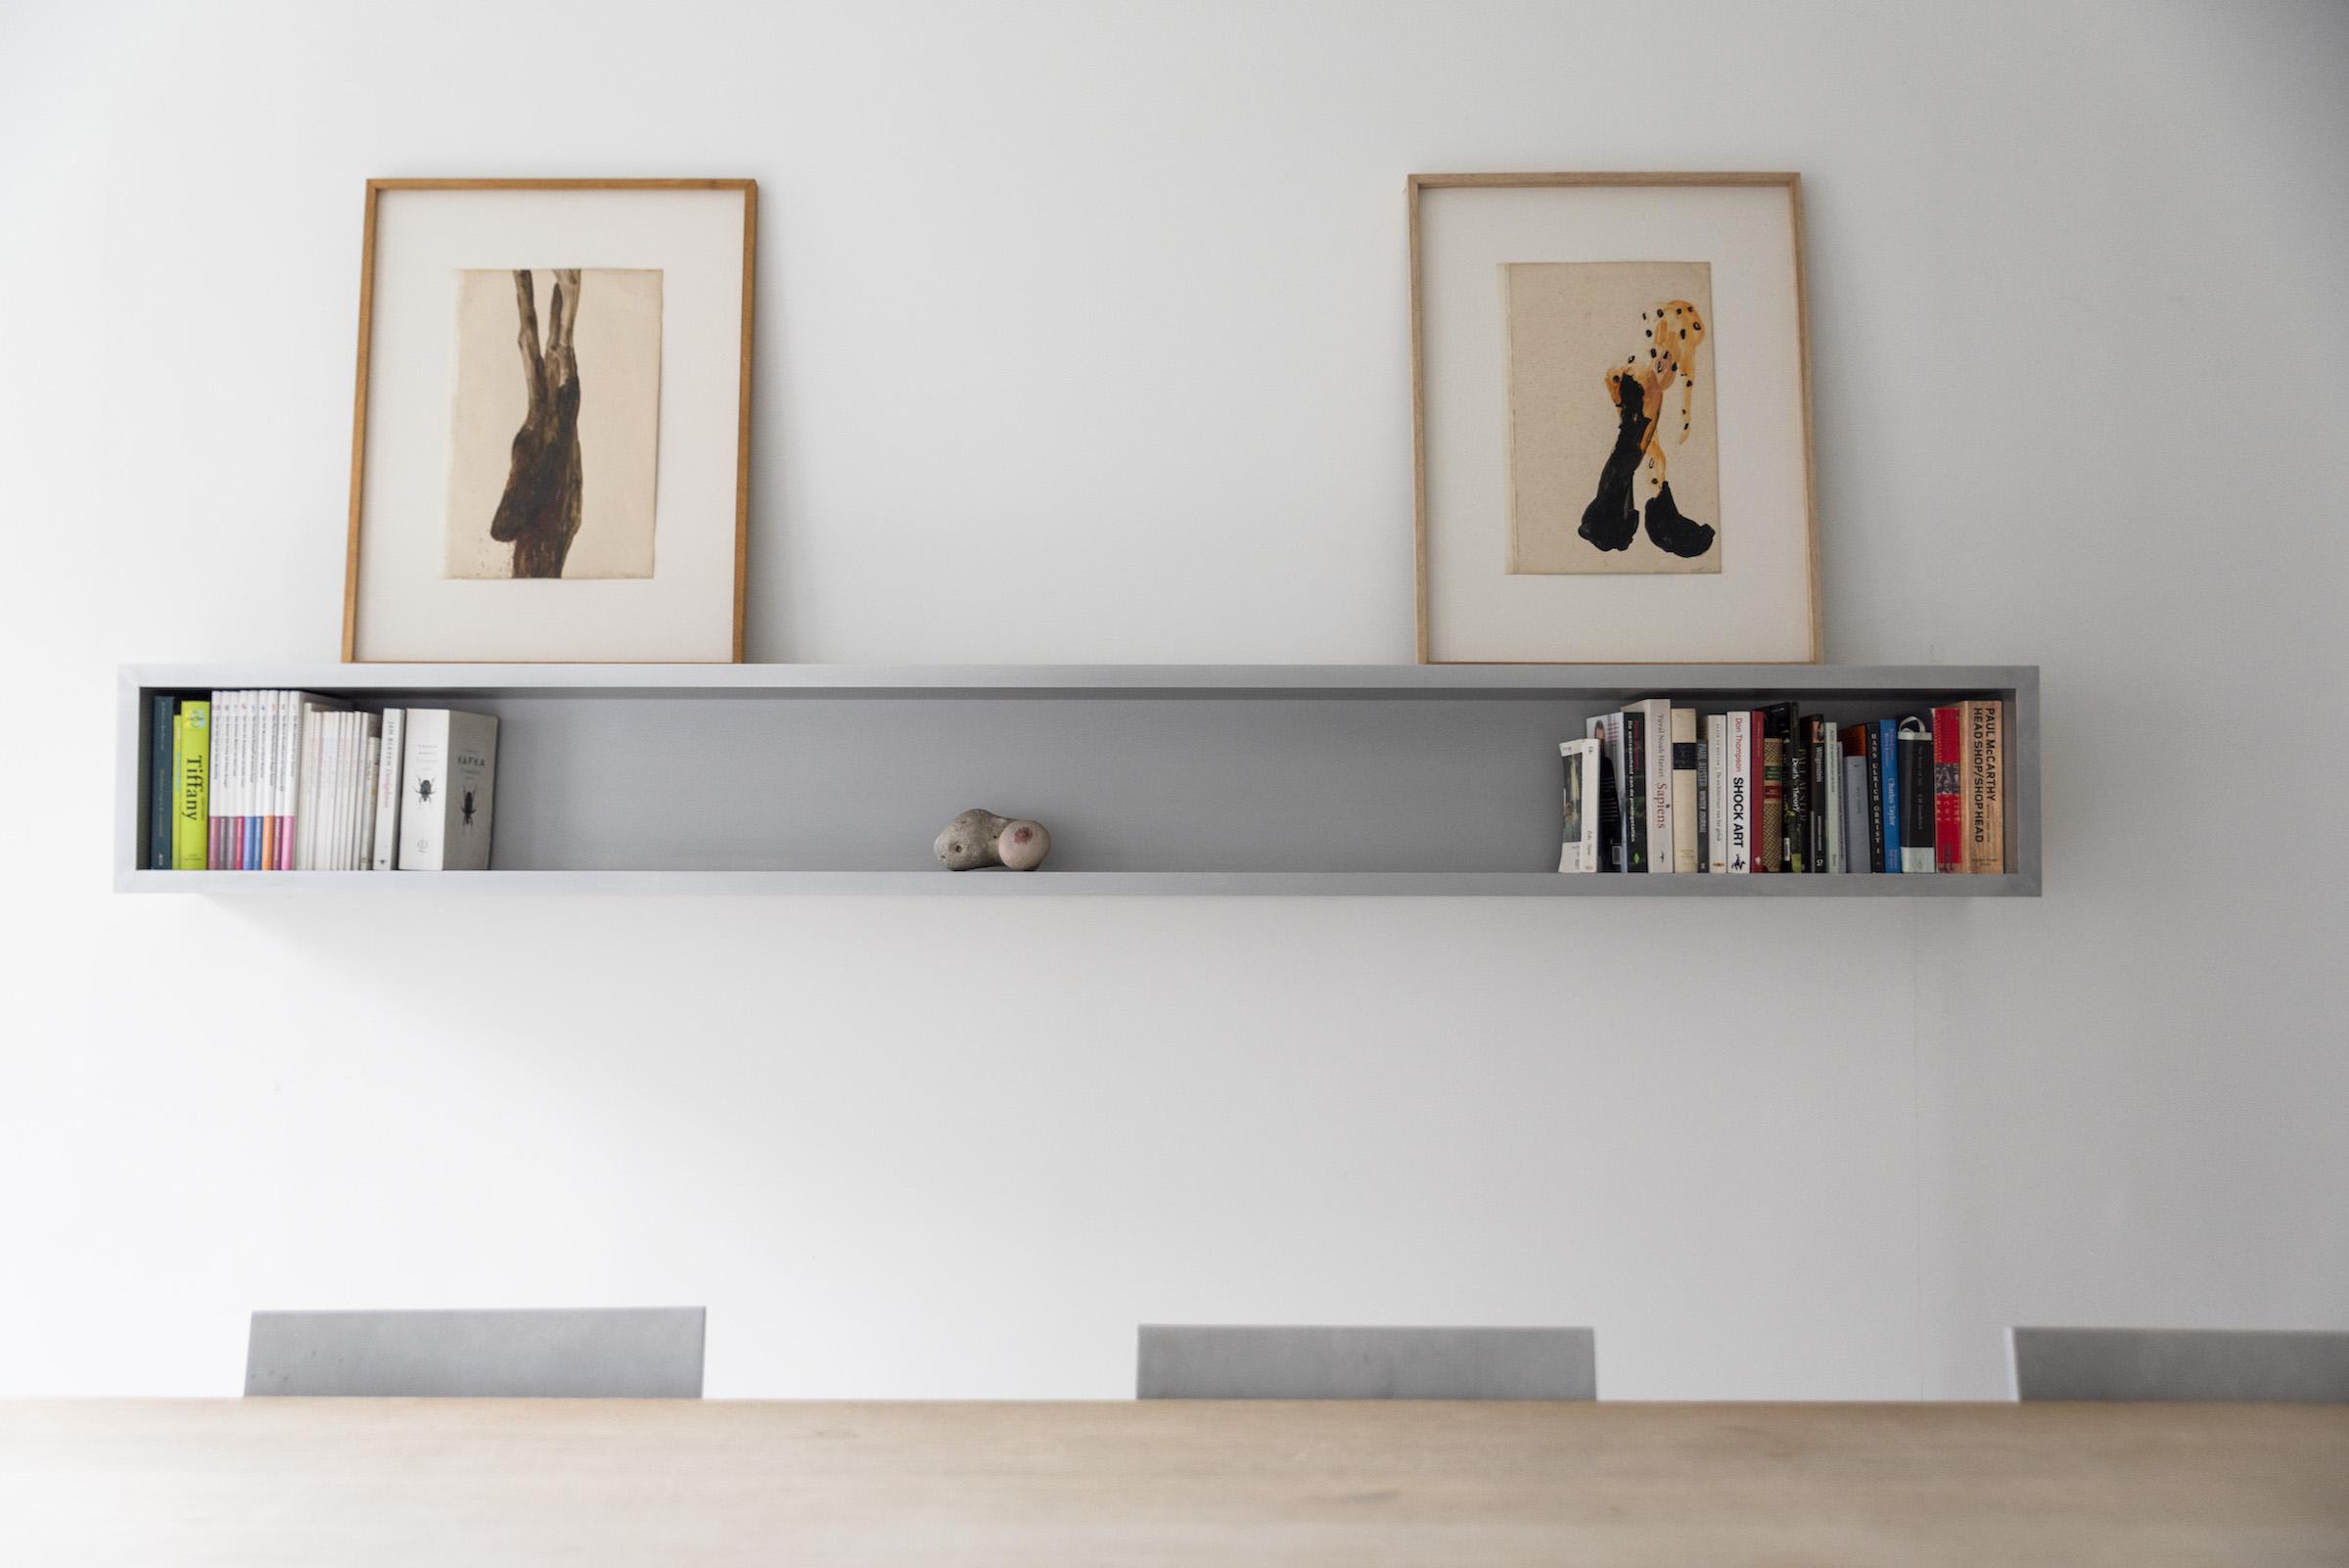 The meeting room with two drawings by Berlinde De Bruyckere (Bloedende Boom and Parasiet). The work in the cupboard is a work by Sofie Muller. Photo: Alexandra Bertels. Courtesy of Joris Beernaert.